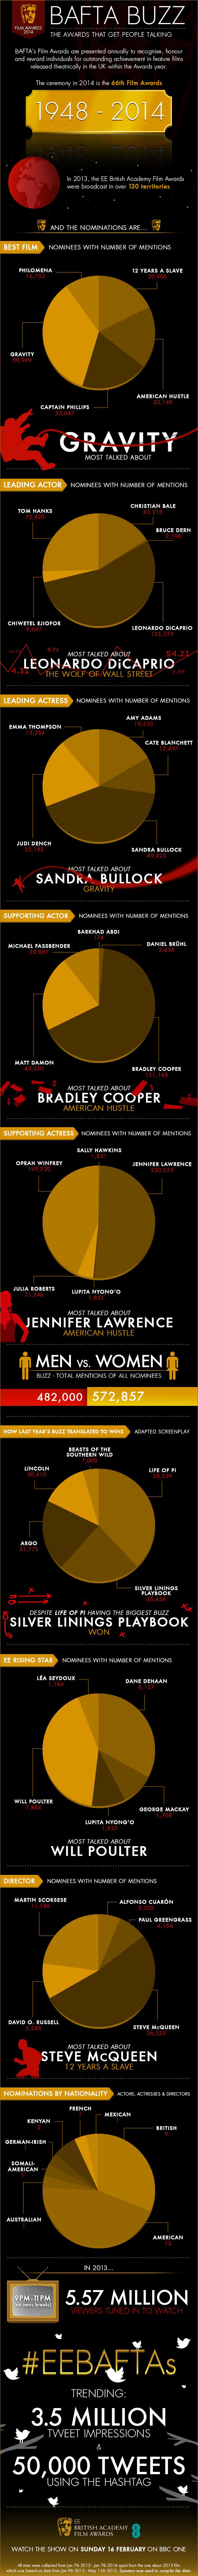 BAFTA Nominations Buzz Infographic